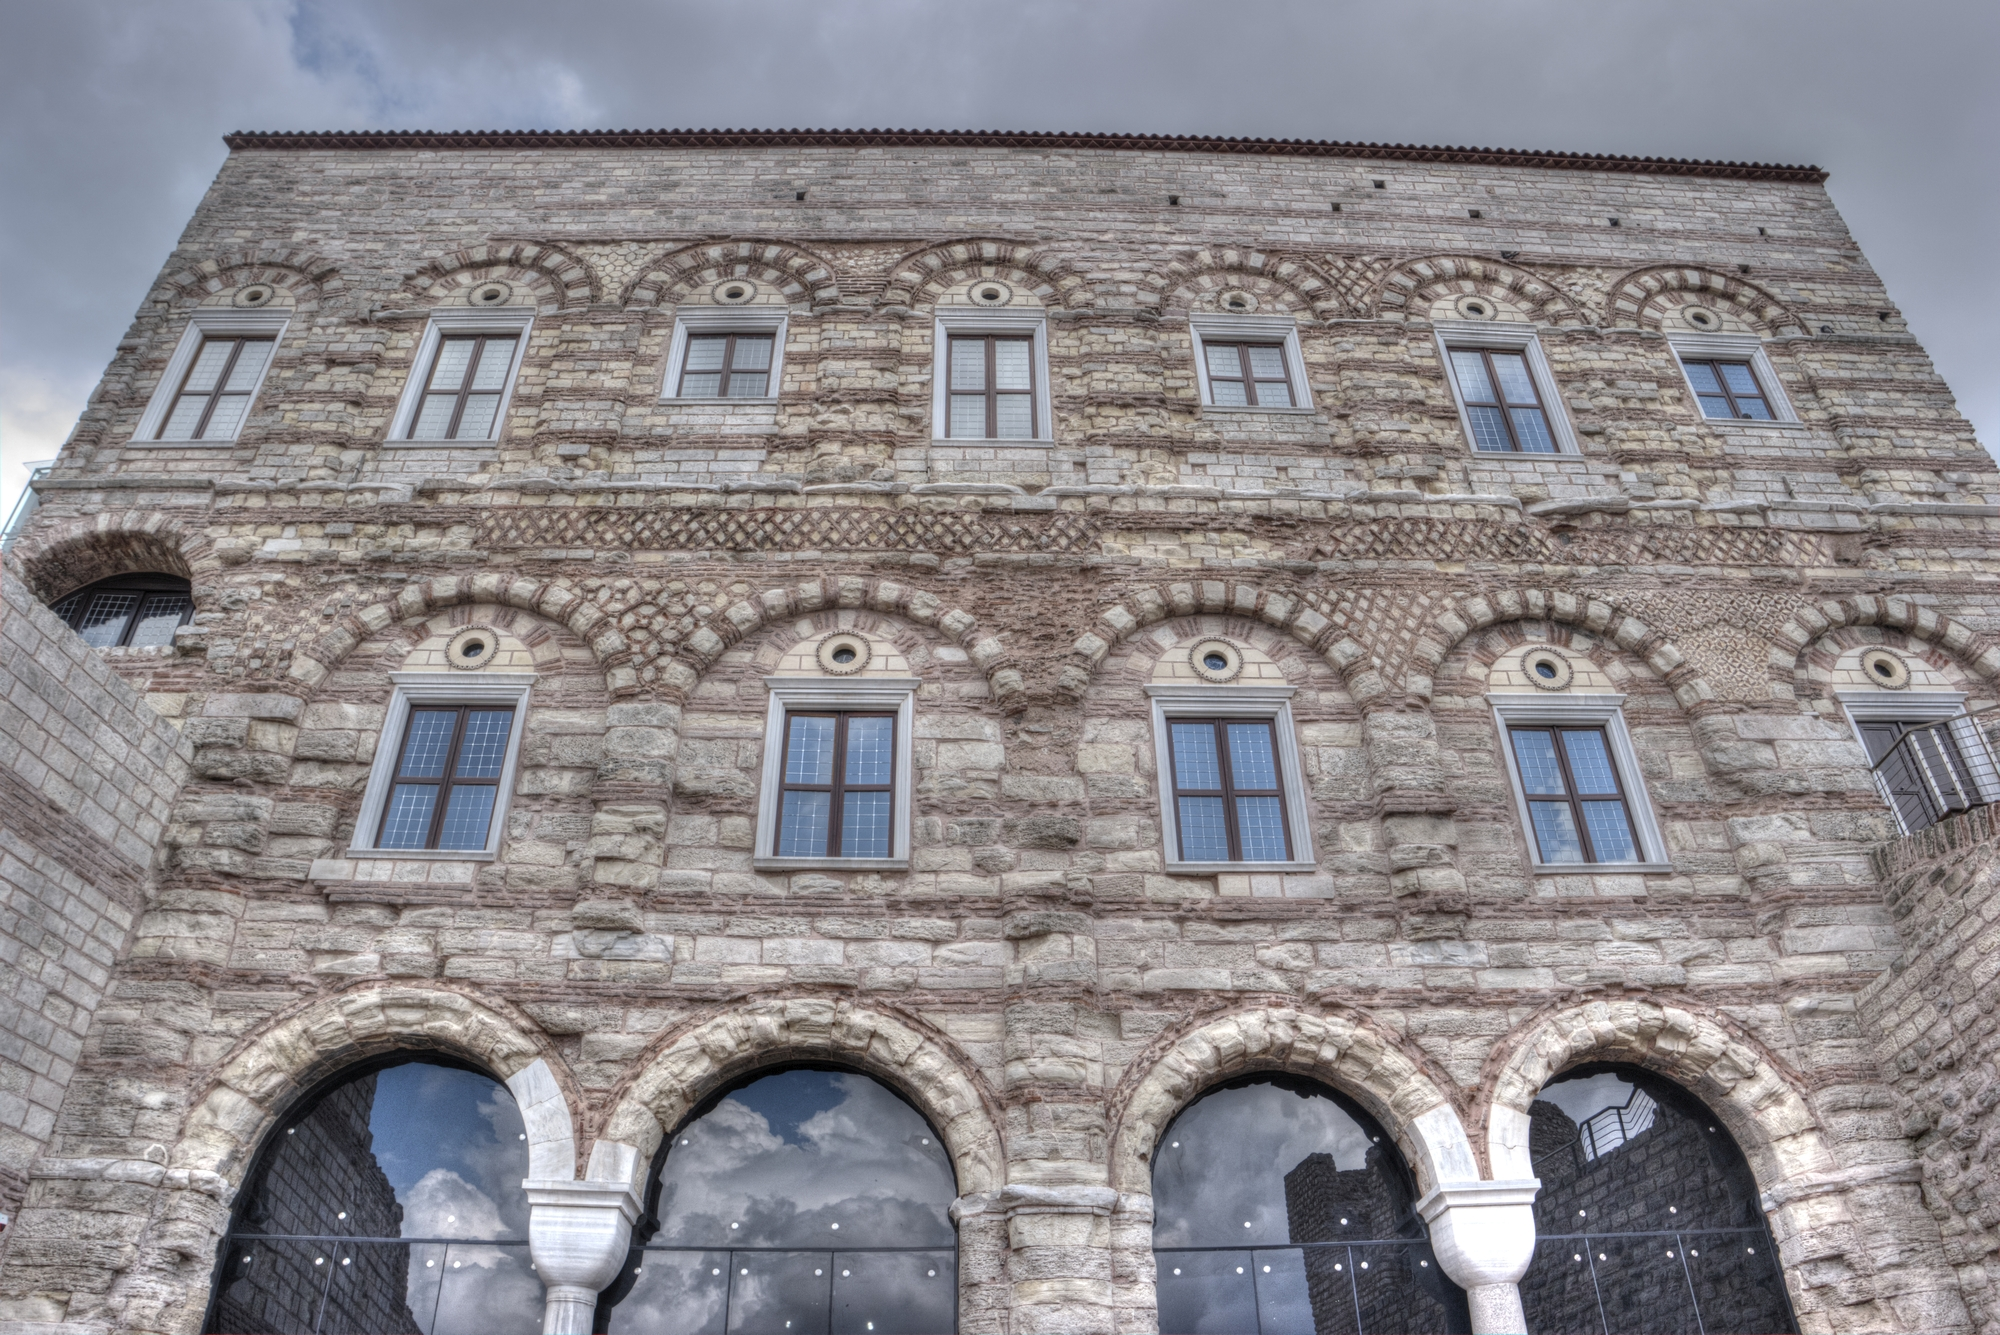 Restored Blachernae Palace Complex in Istanbul